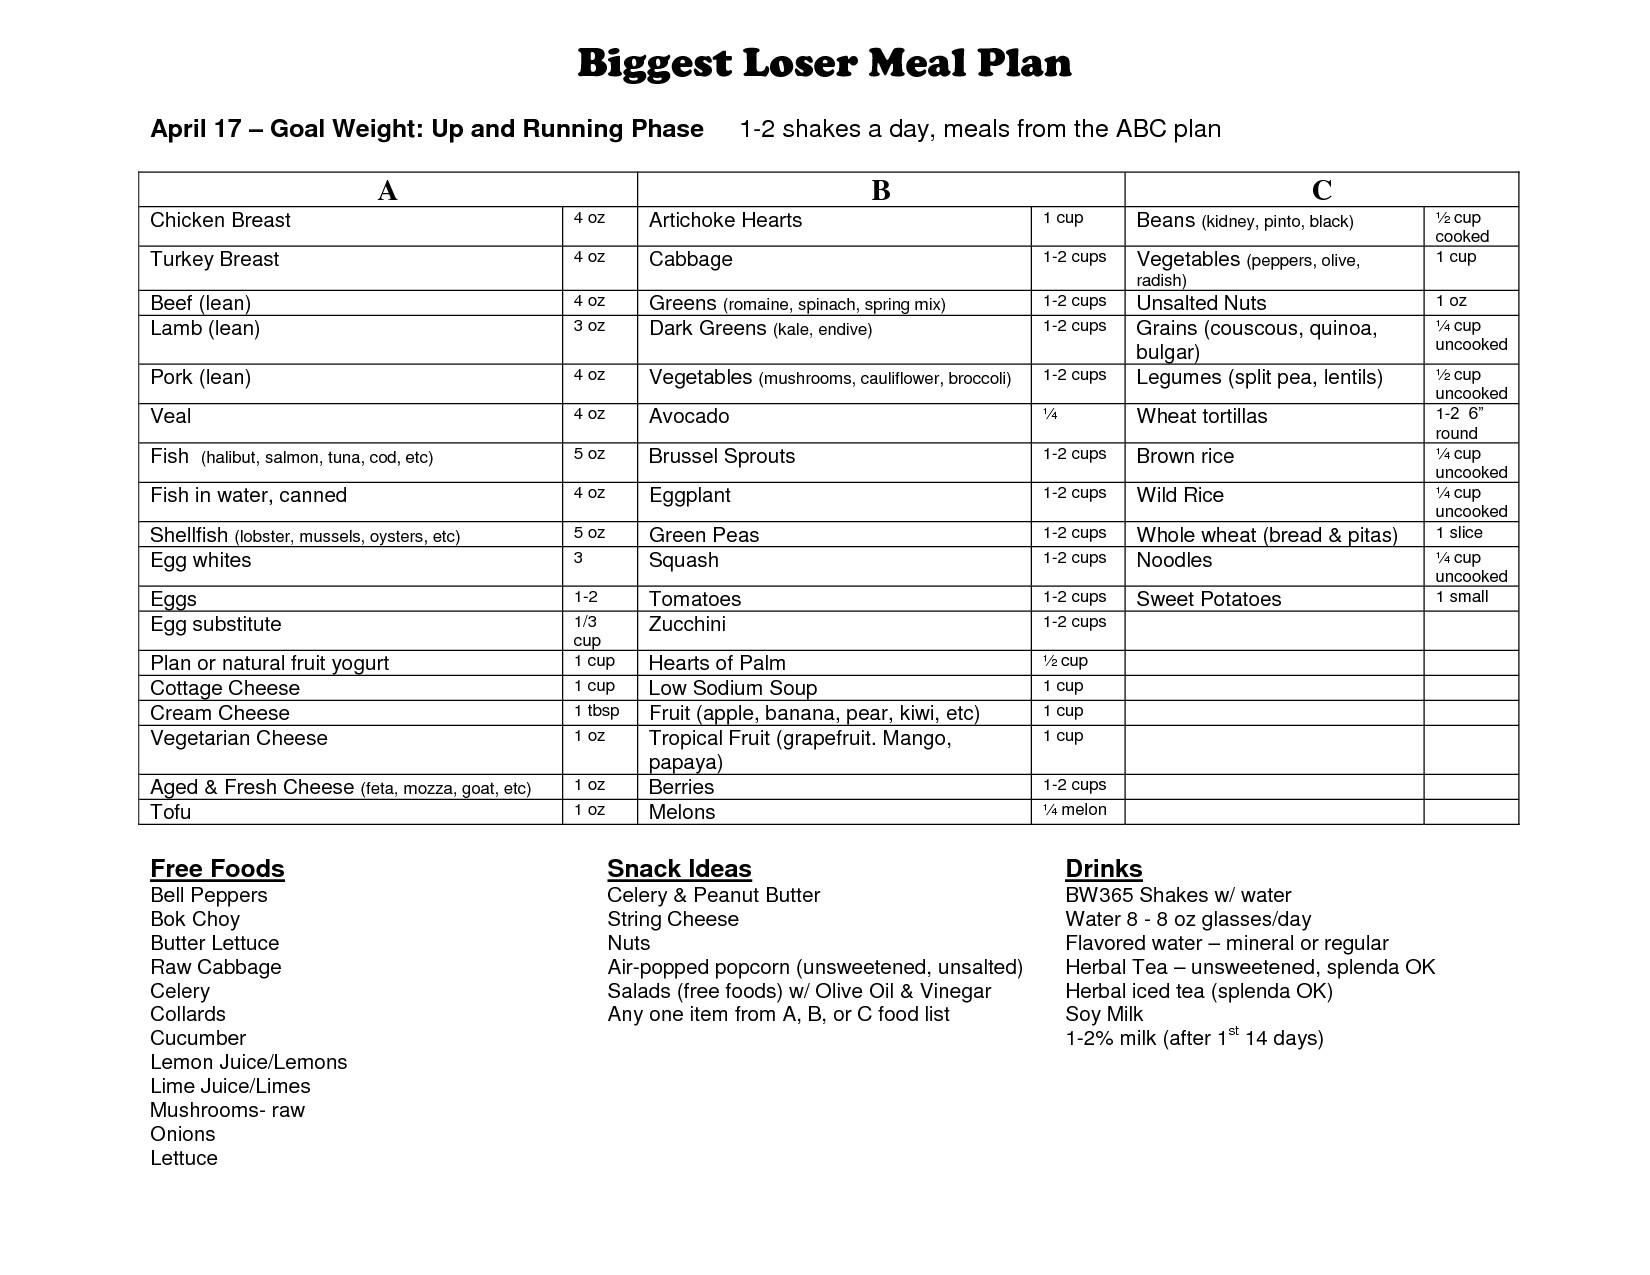 weight loss work challenge ideas 9